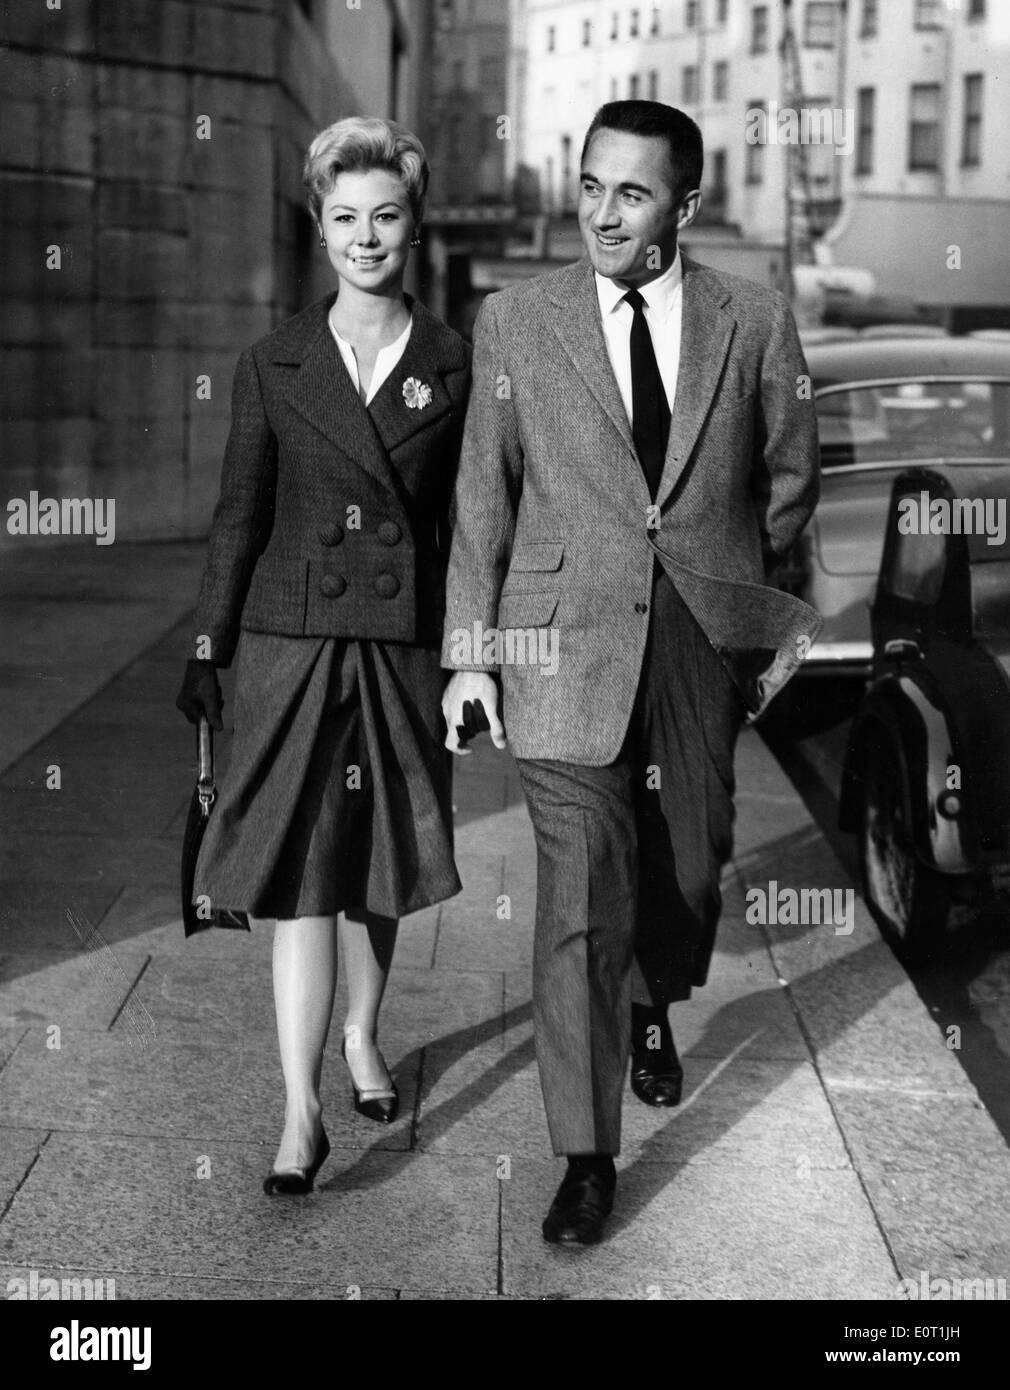 George Cole (1925?015),Martin Freeman (born 1971) Hot tube Mia Wesley,Linda Lawson (actress)